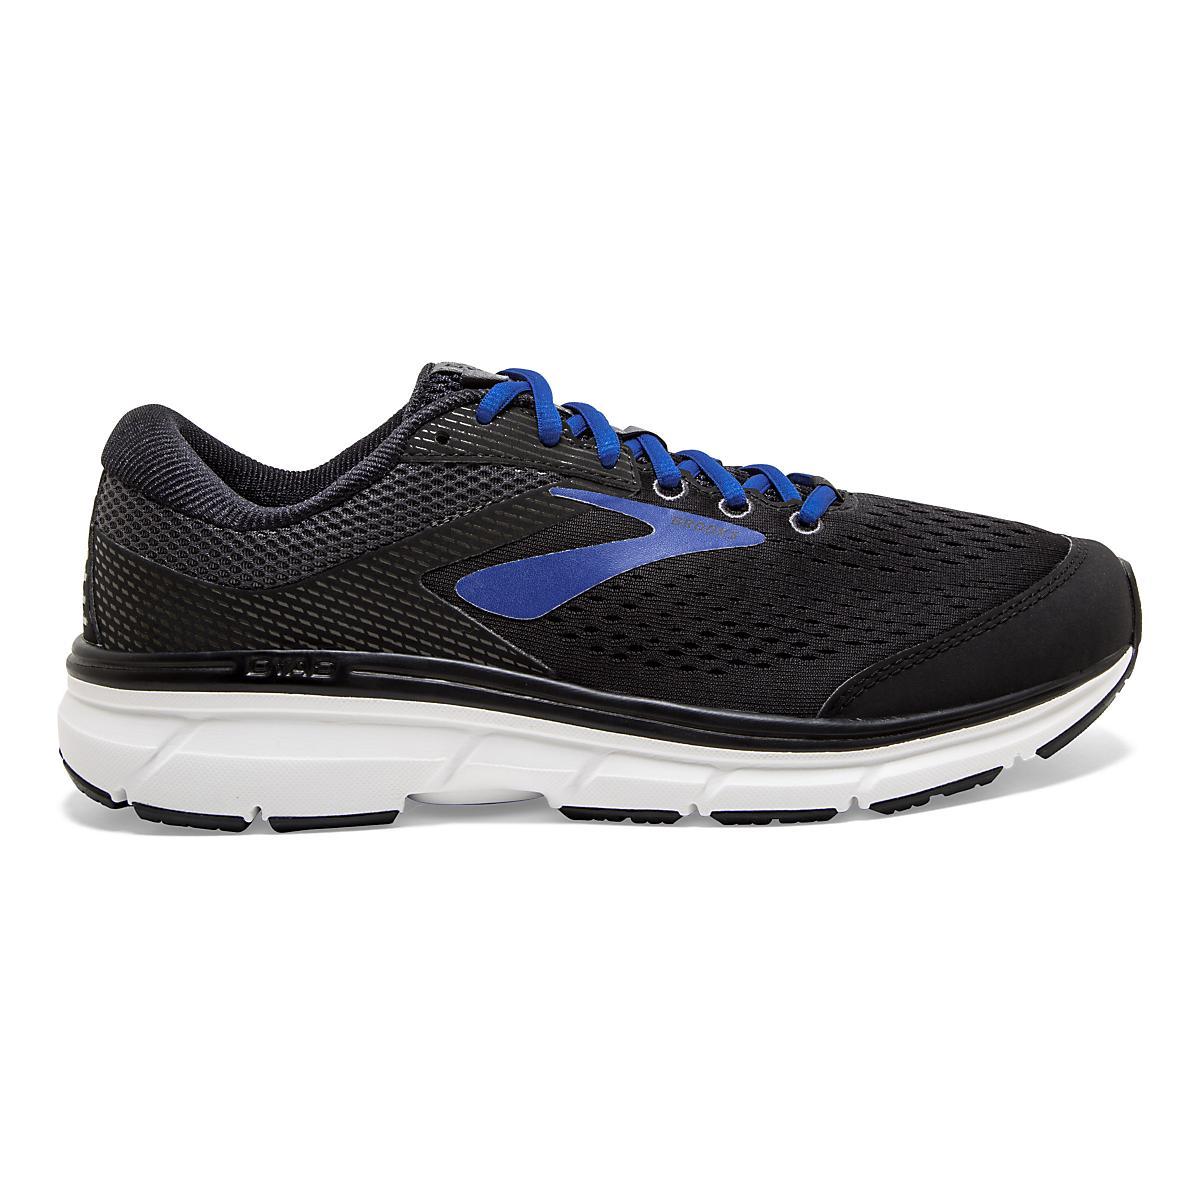 44f86cd1208 Mens Brooks Dyad 10 Running Shoe at Road Runner Sports